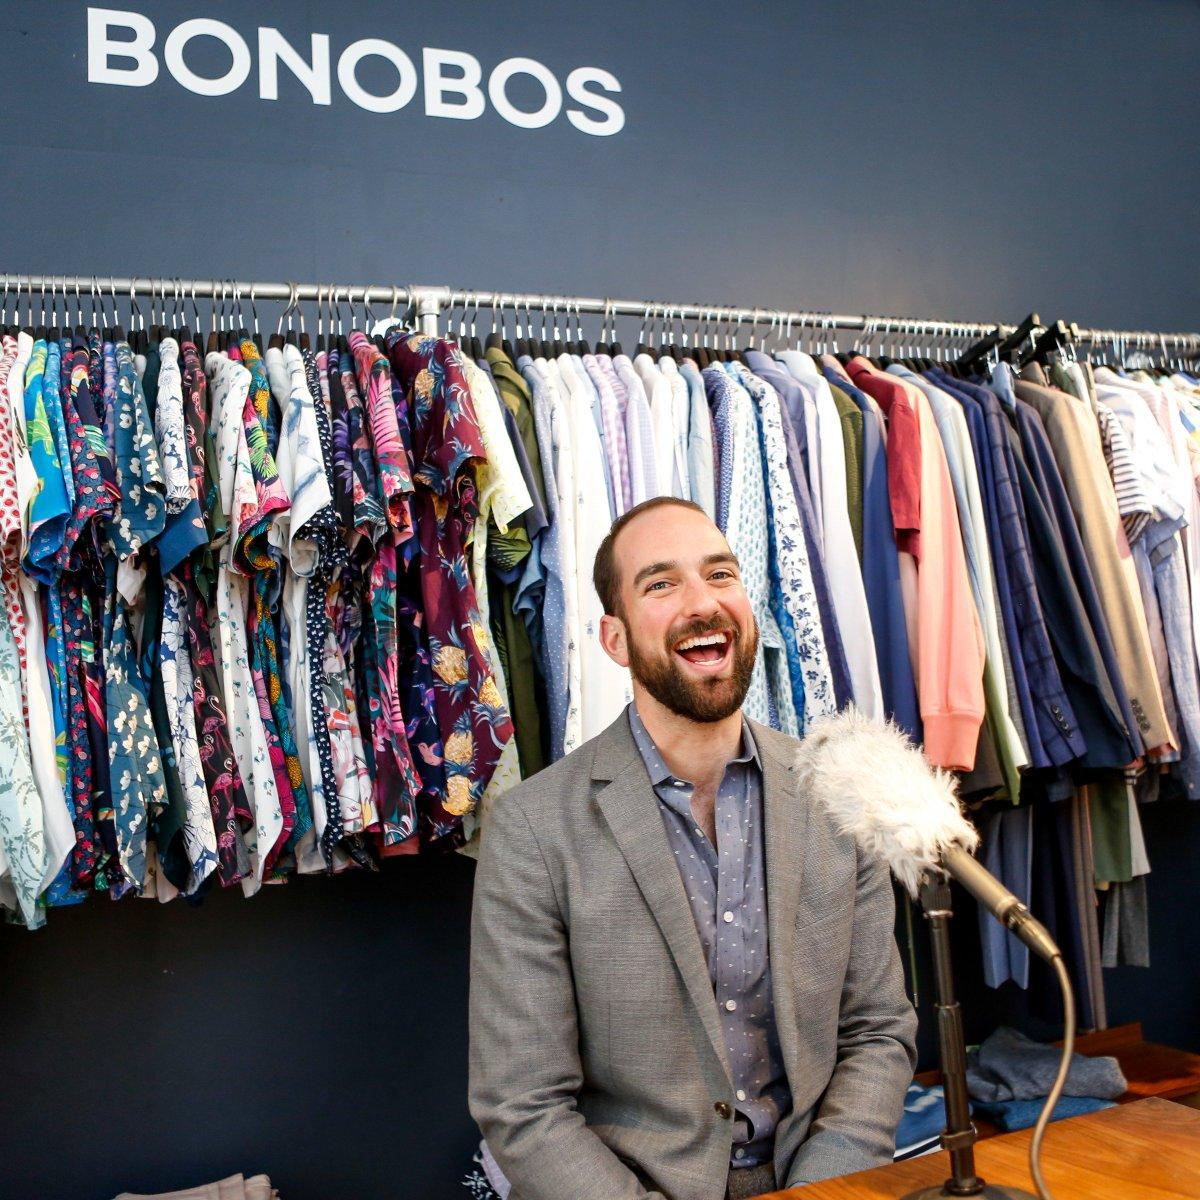 Bonobos photo